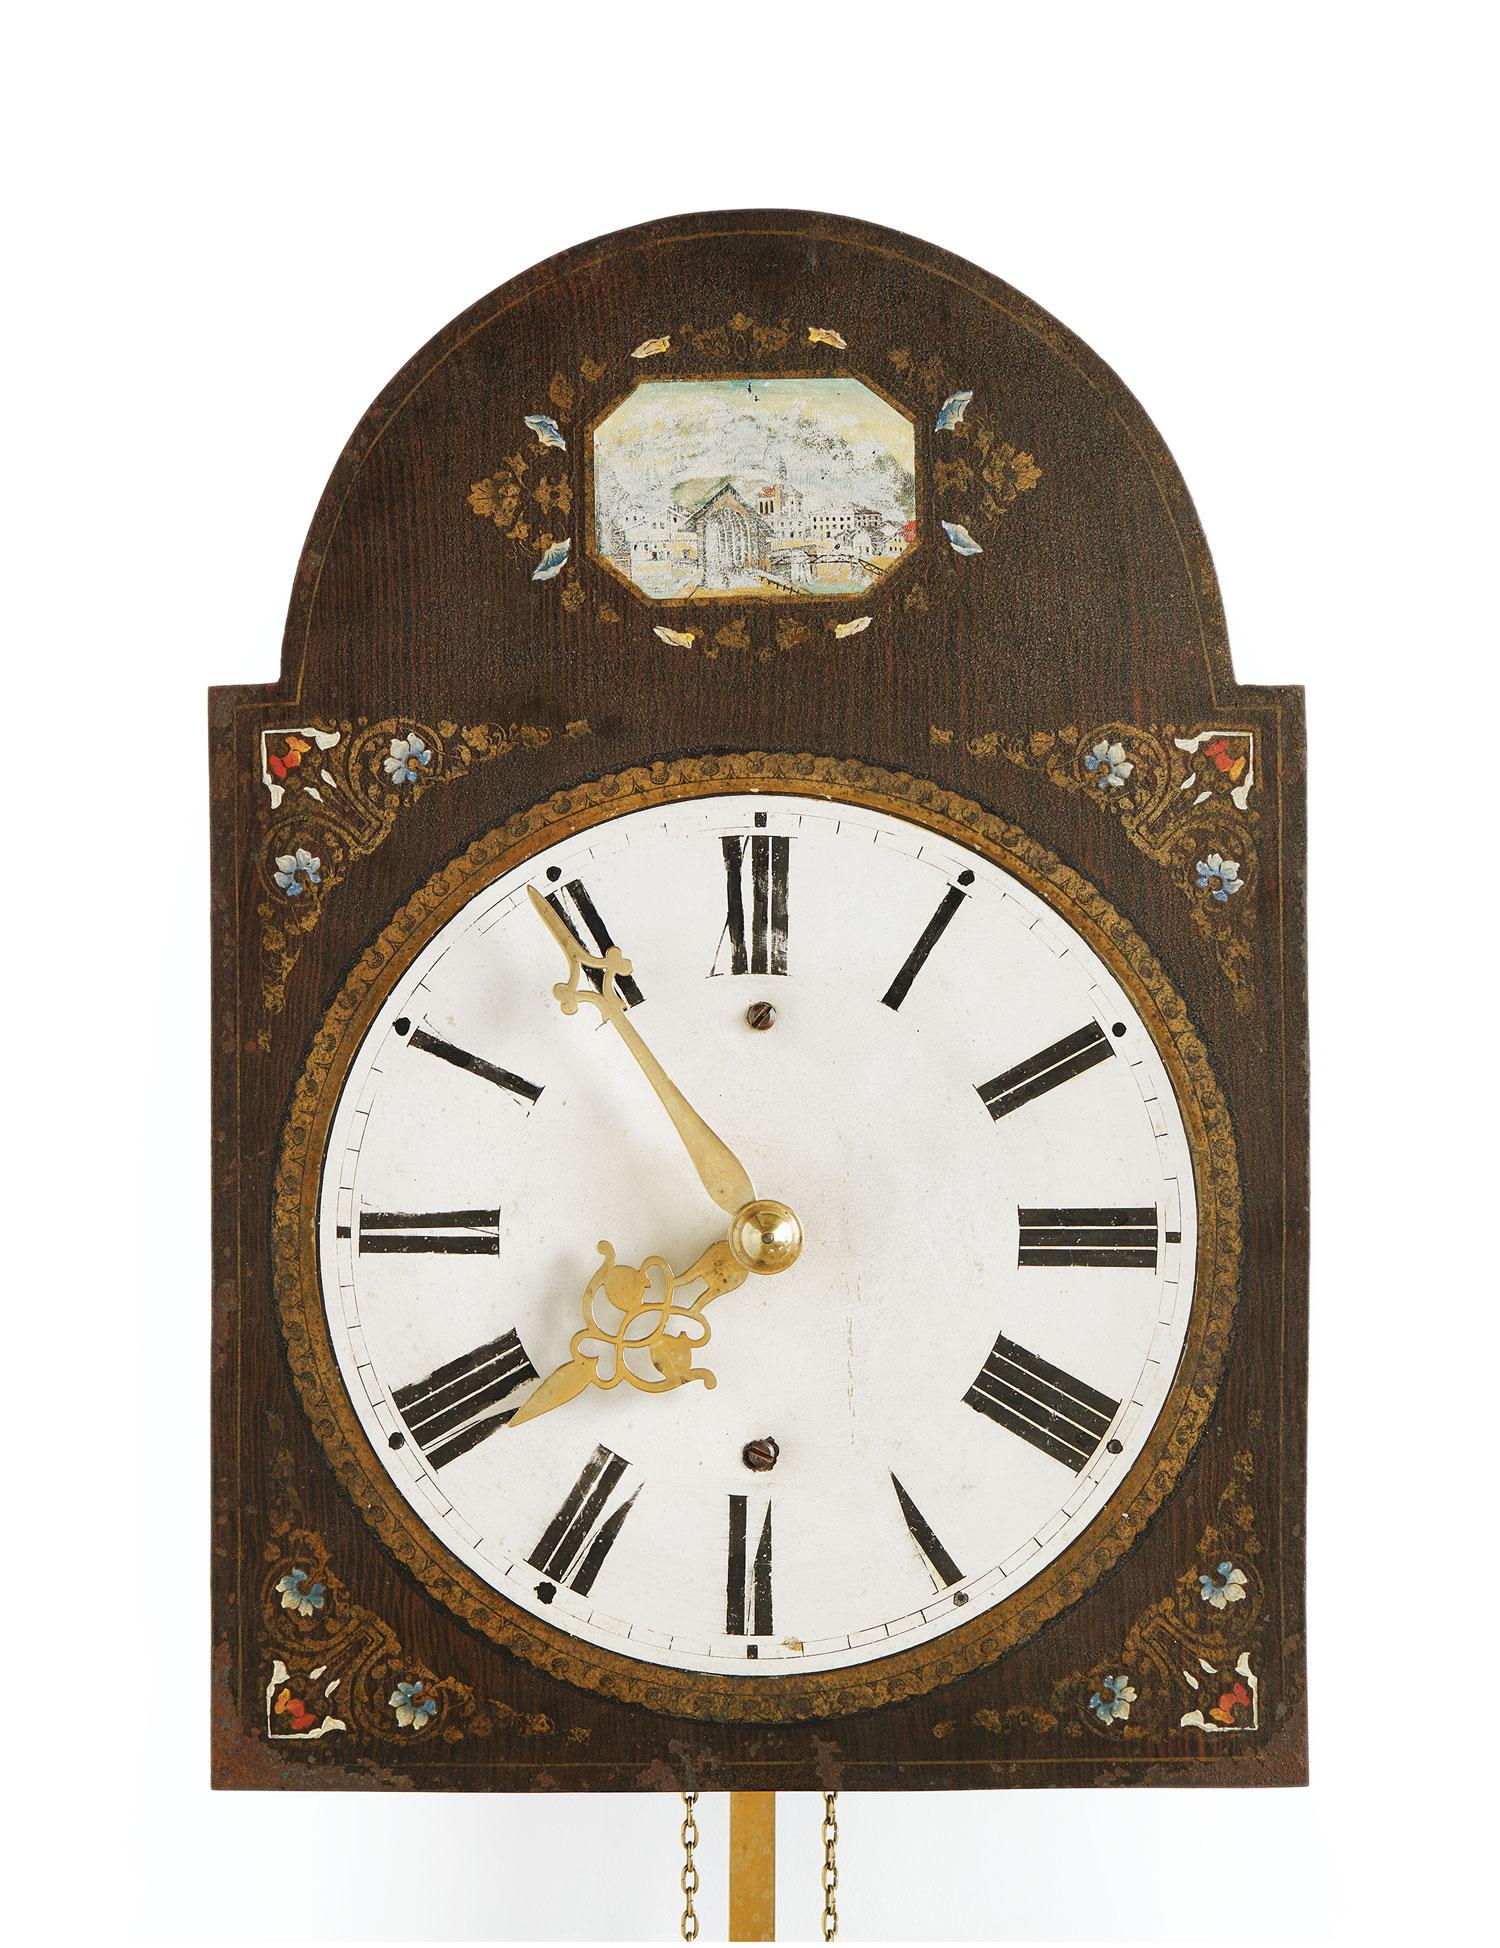 mandtler-clock-mennonite-1865-mc0217.jpg